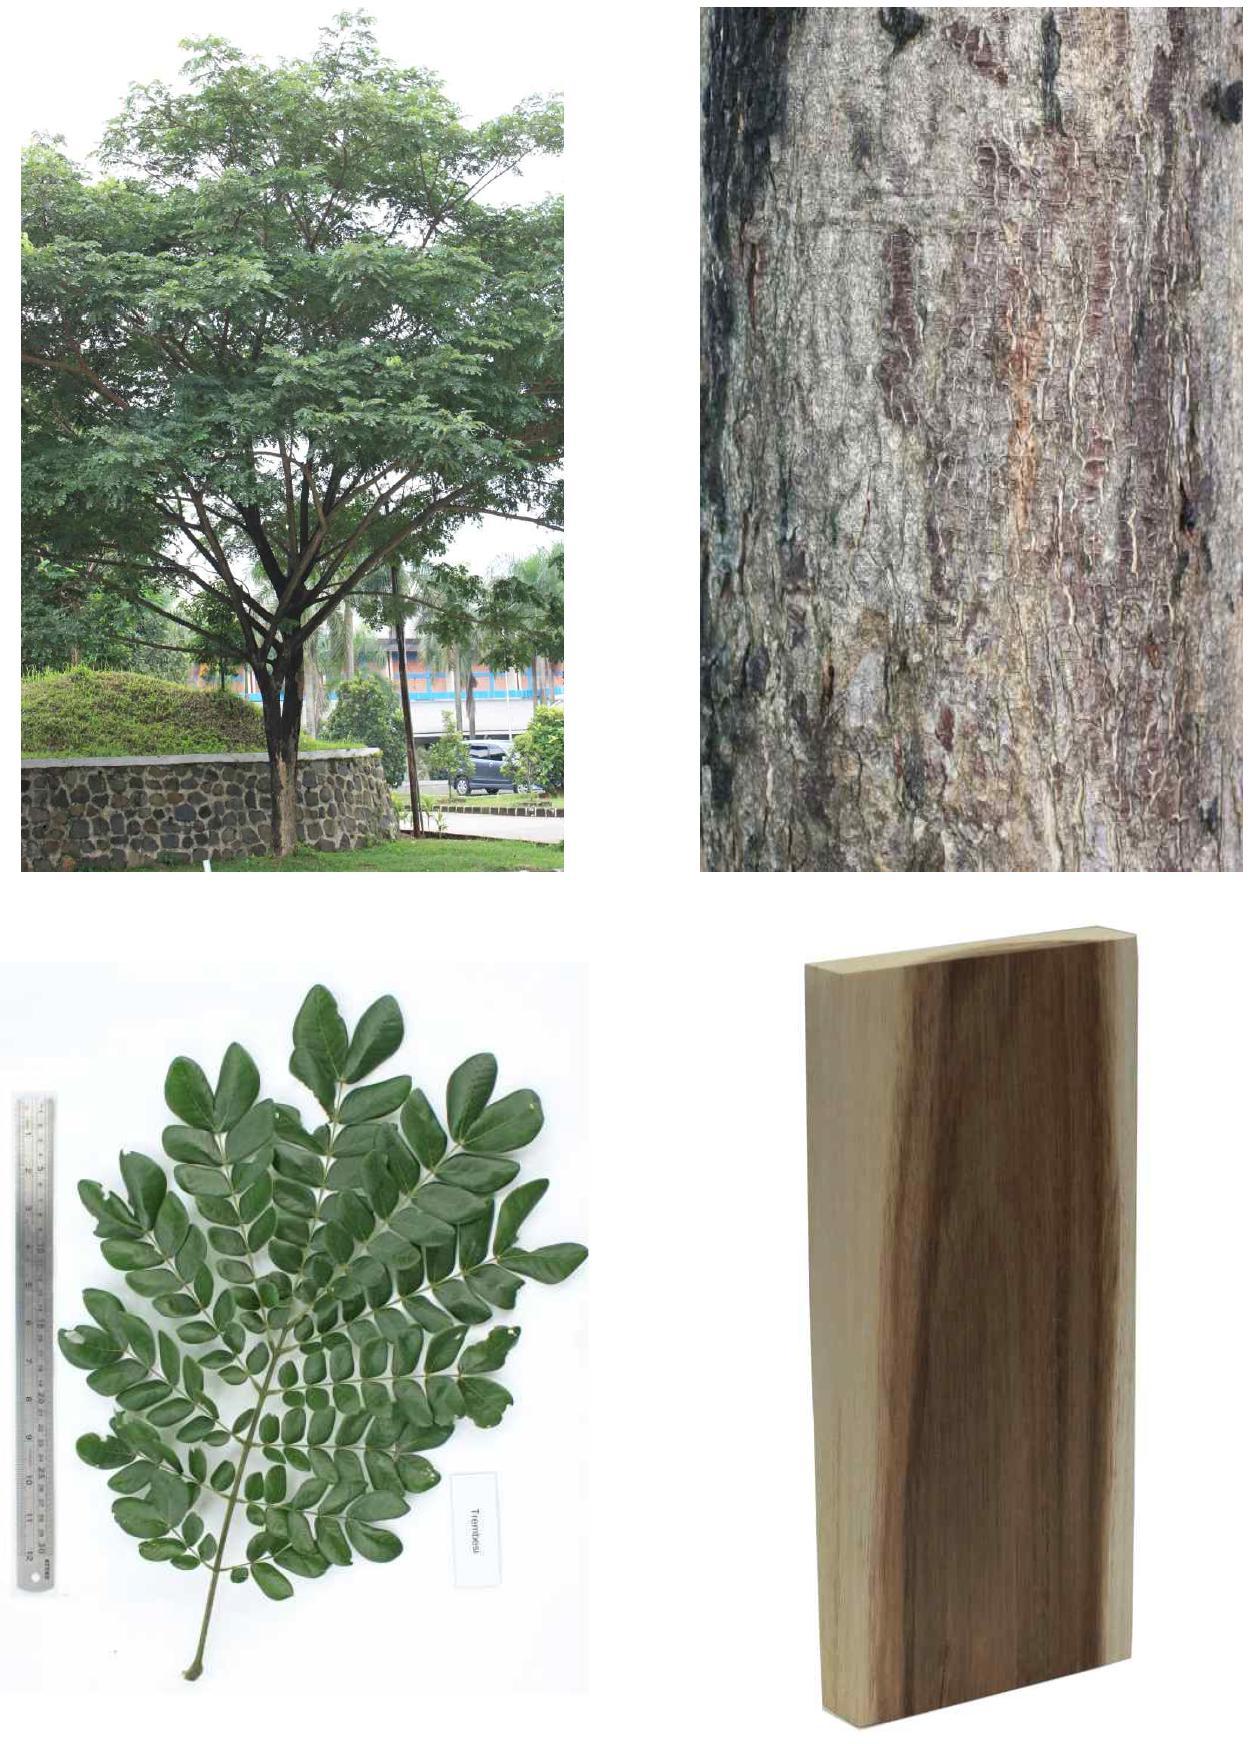 Trembesi의 전체수형, 수피, 잎 및 재면.